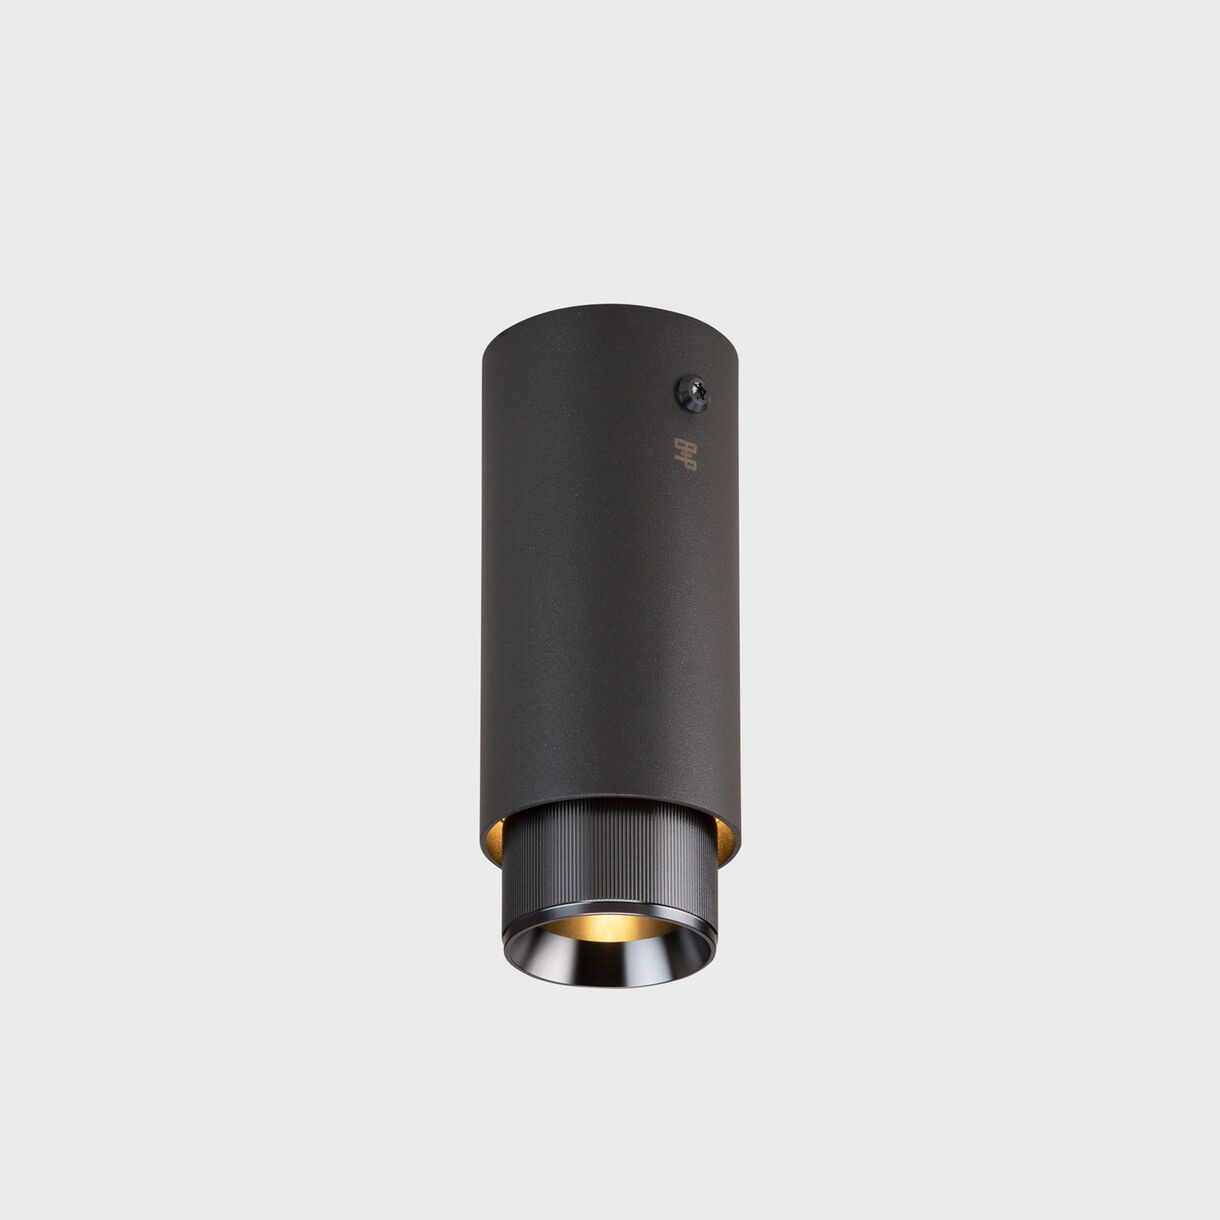 Exhaust Surface Light, Graphite & Gunmetal